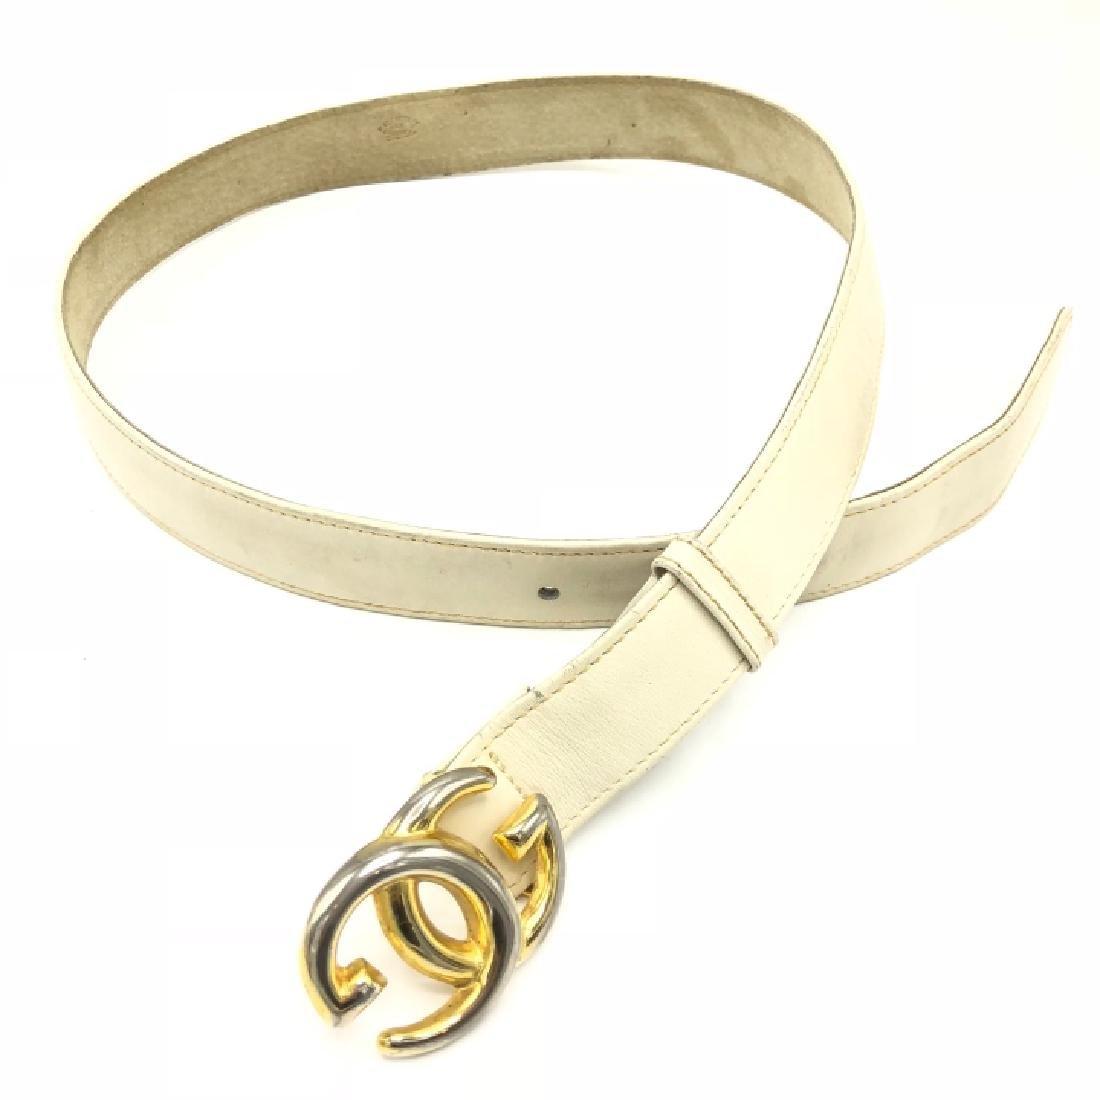 Authentic Vintage Gucci GG Logo Leather Belt - 3